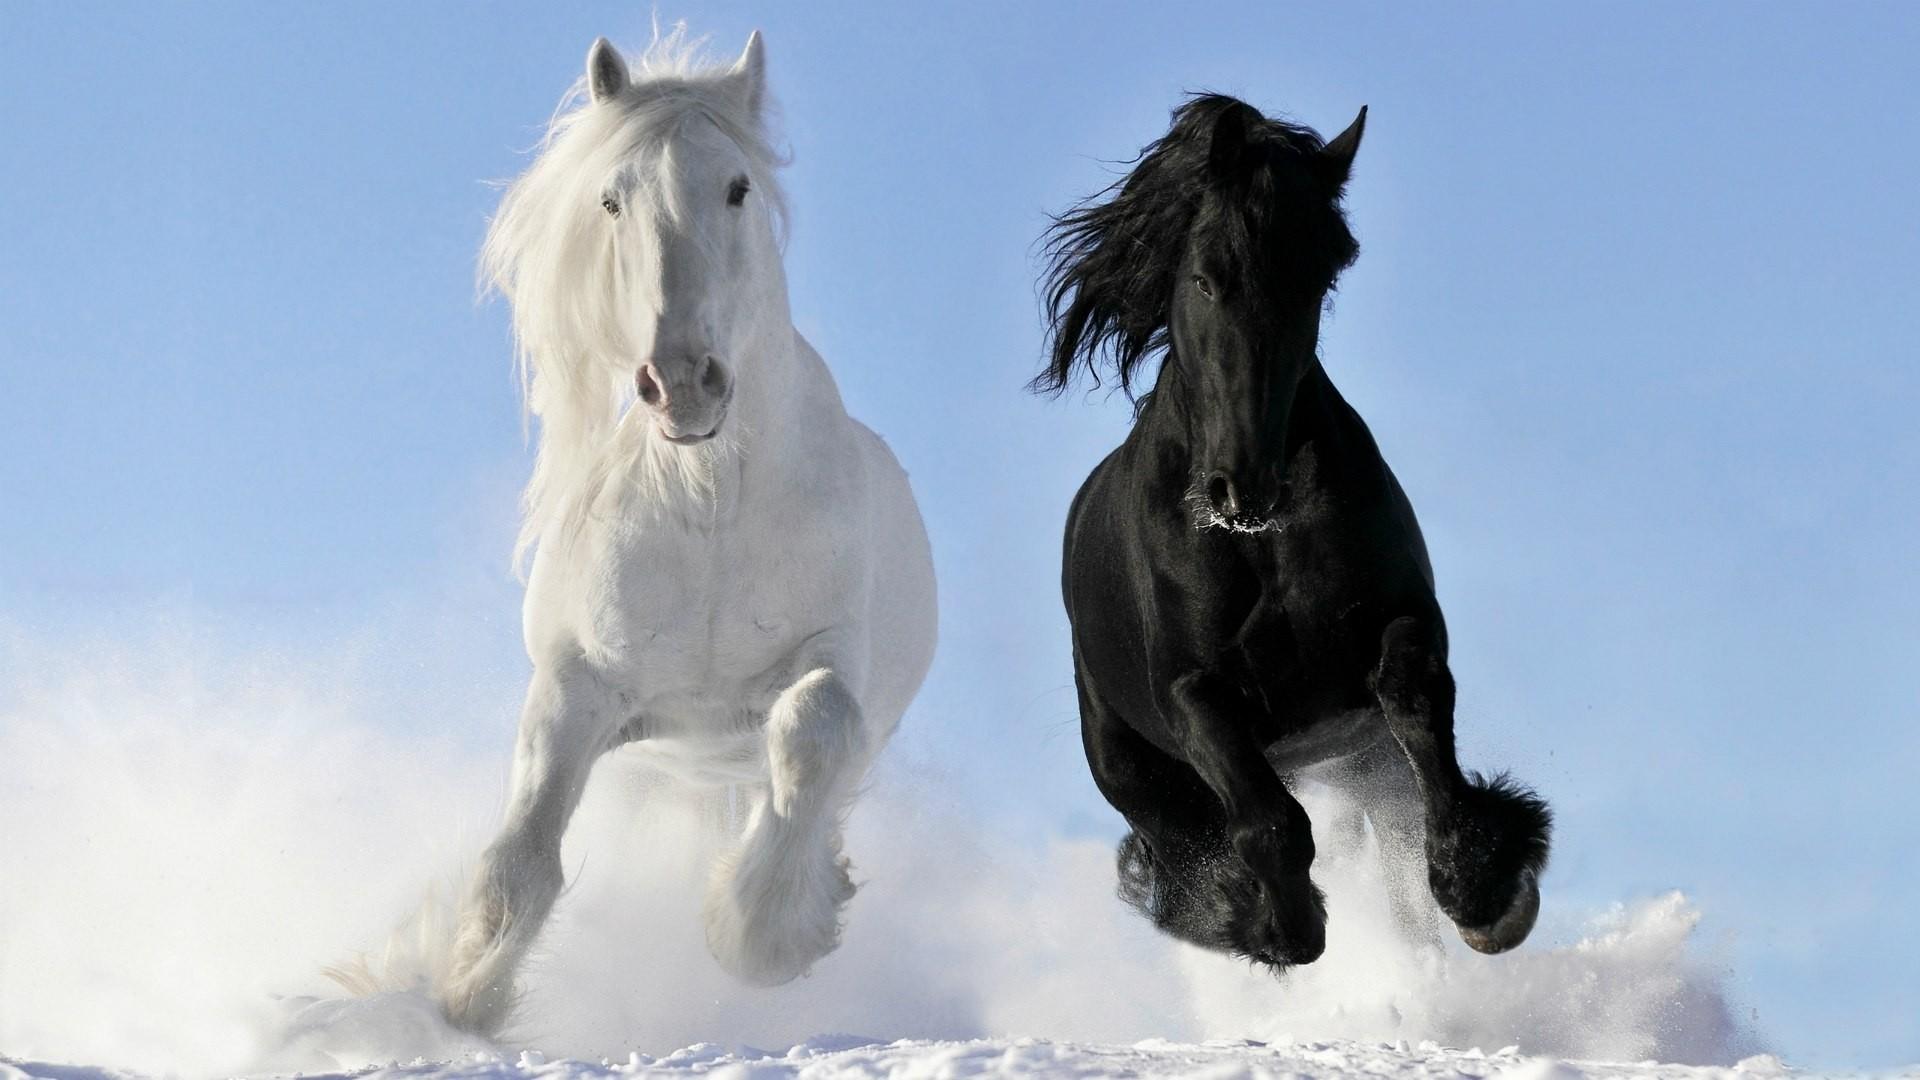 White Horse wallpaper photo hd